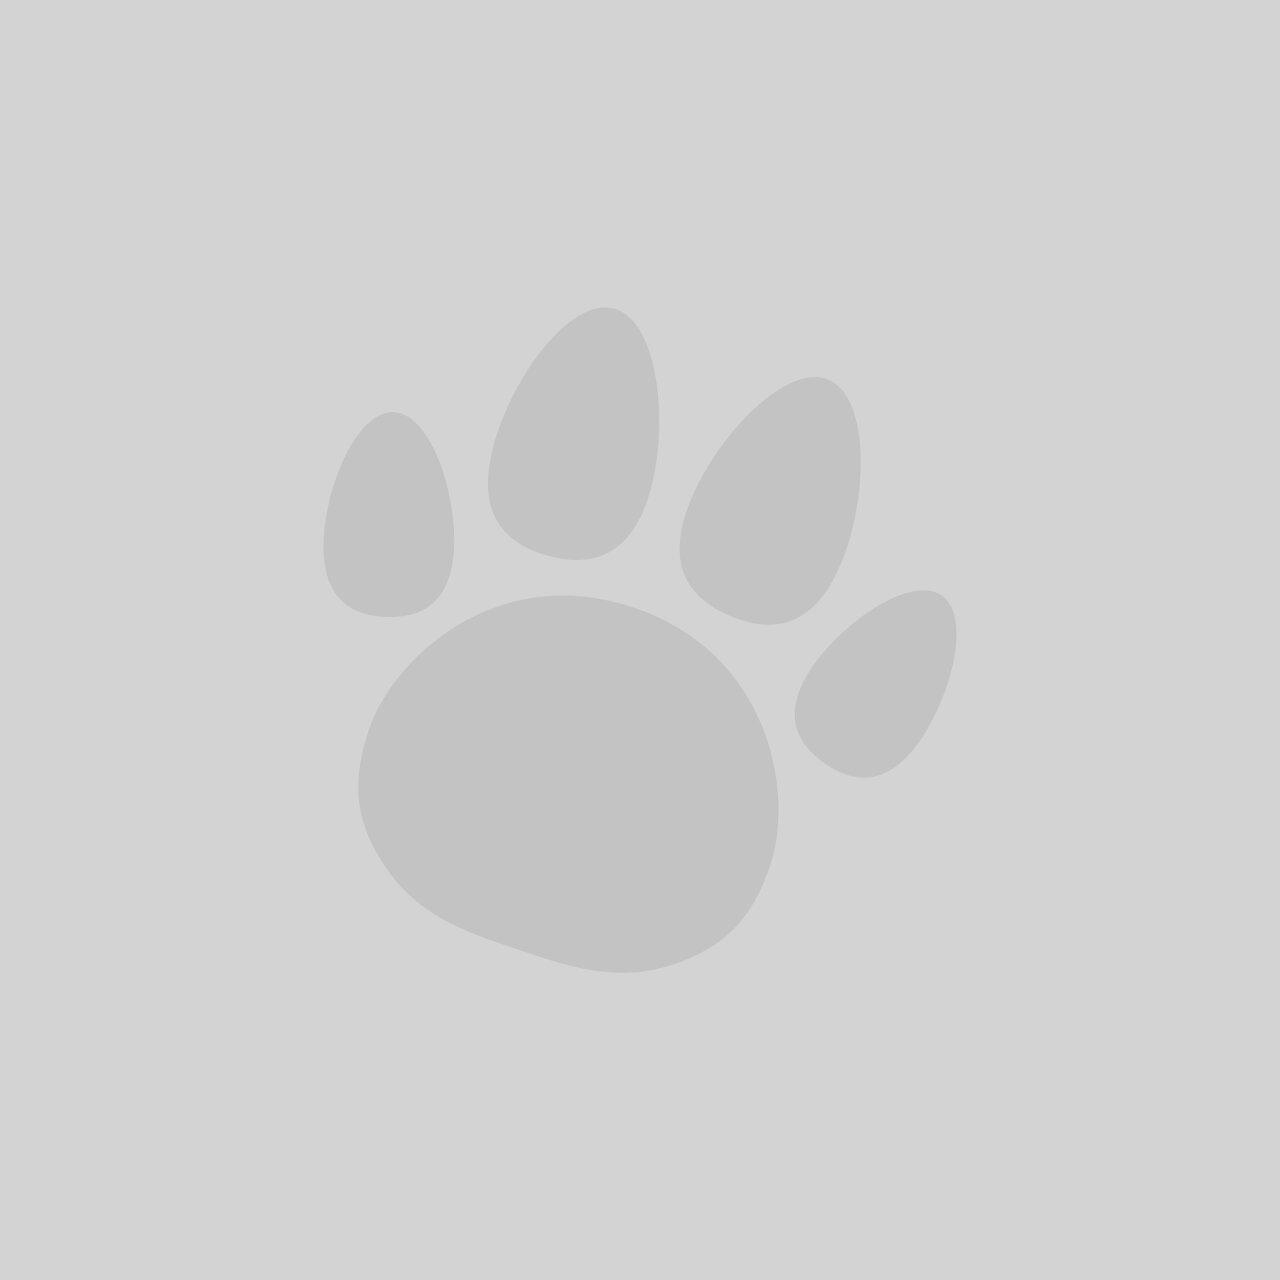 Pedigree Dentastix Twice Weekly Medium Dog Dental Chews 3 Pack